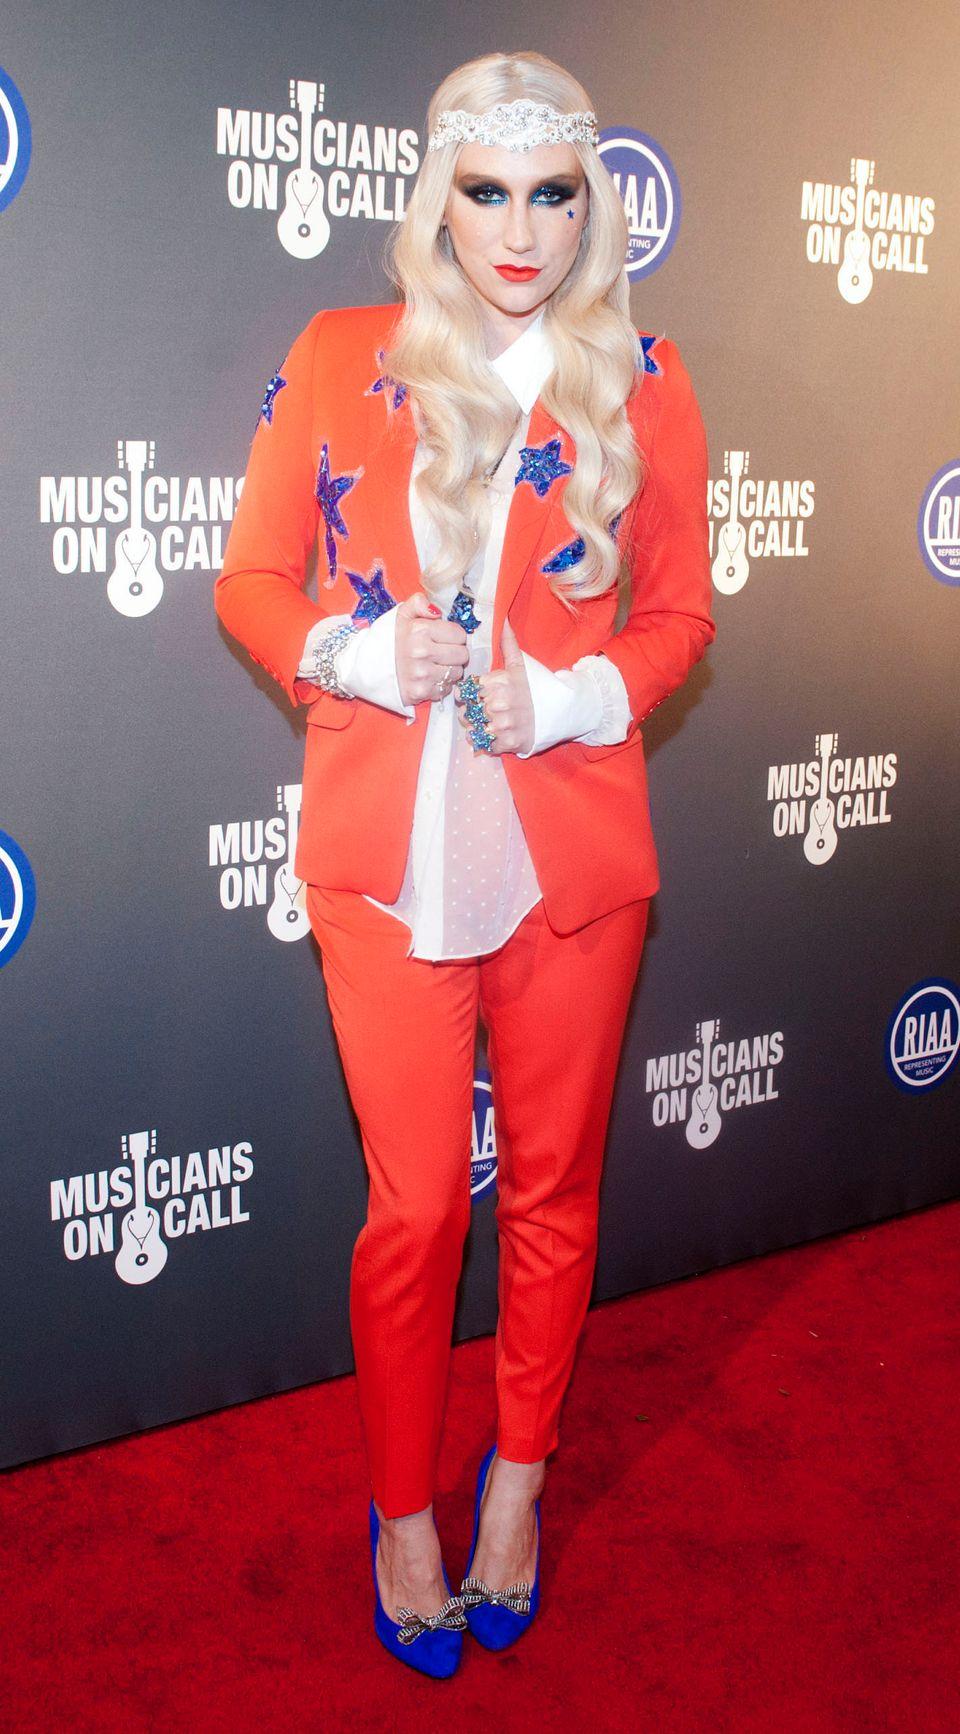 WASHINGTON, DC - JANUARY 21: Ke$ha attends the RIAA Presidential Inaugural Charity Benefit at the 9:30 Club on January 21, 20